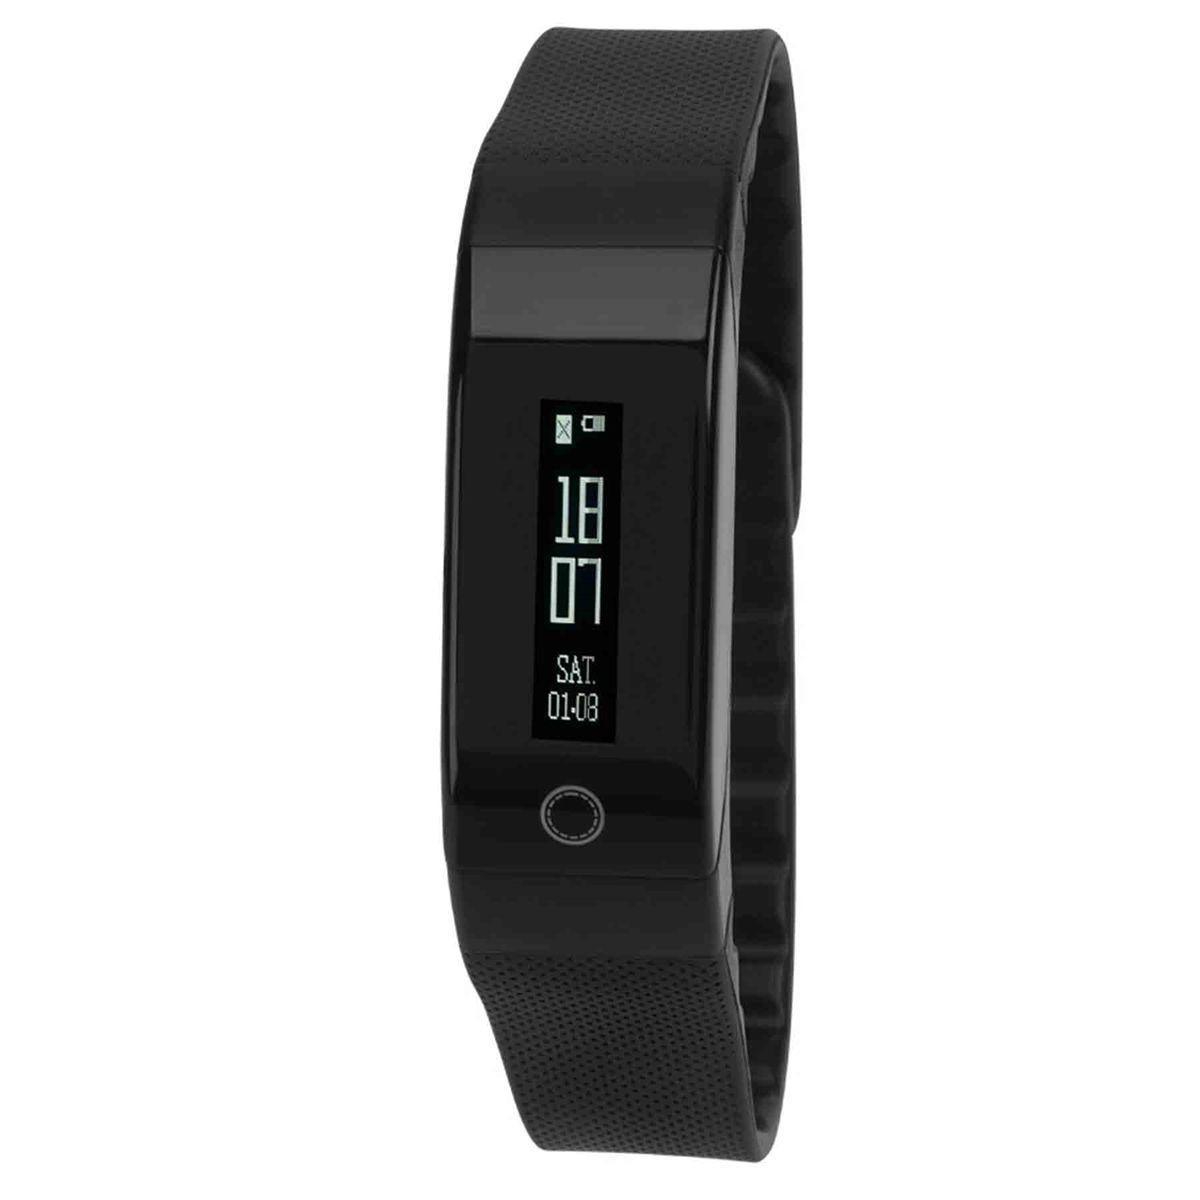 84fea0ec23e36 Relógio Mormaii Unissex FitPulse MOSW007 8P - Relógios de Fábrica